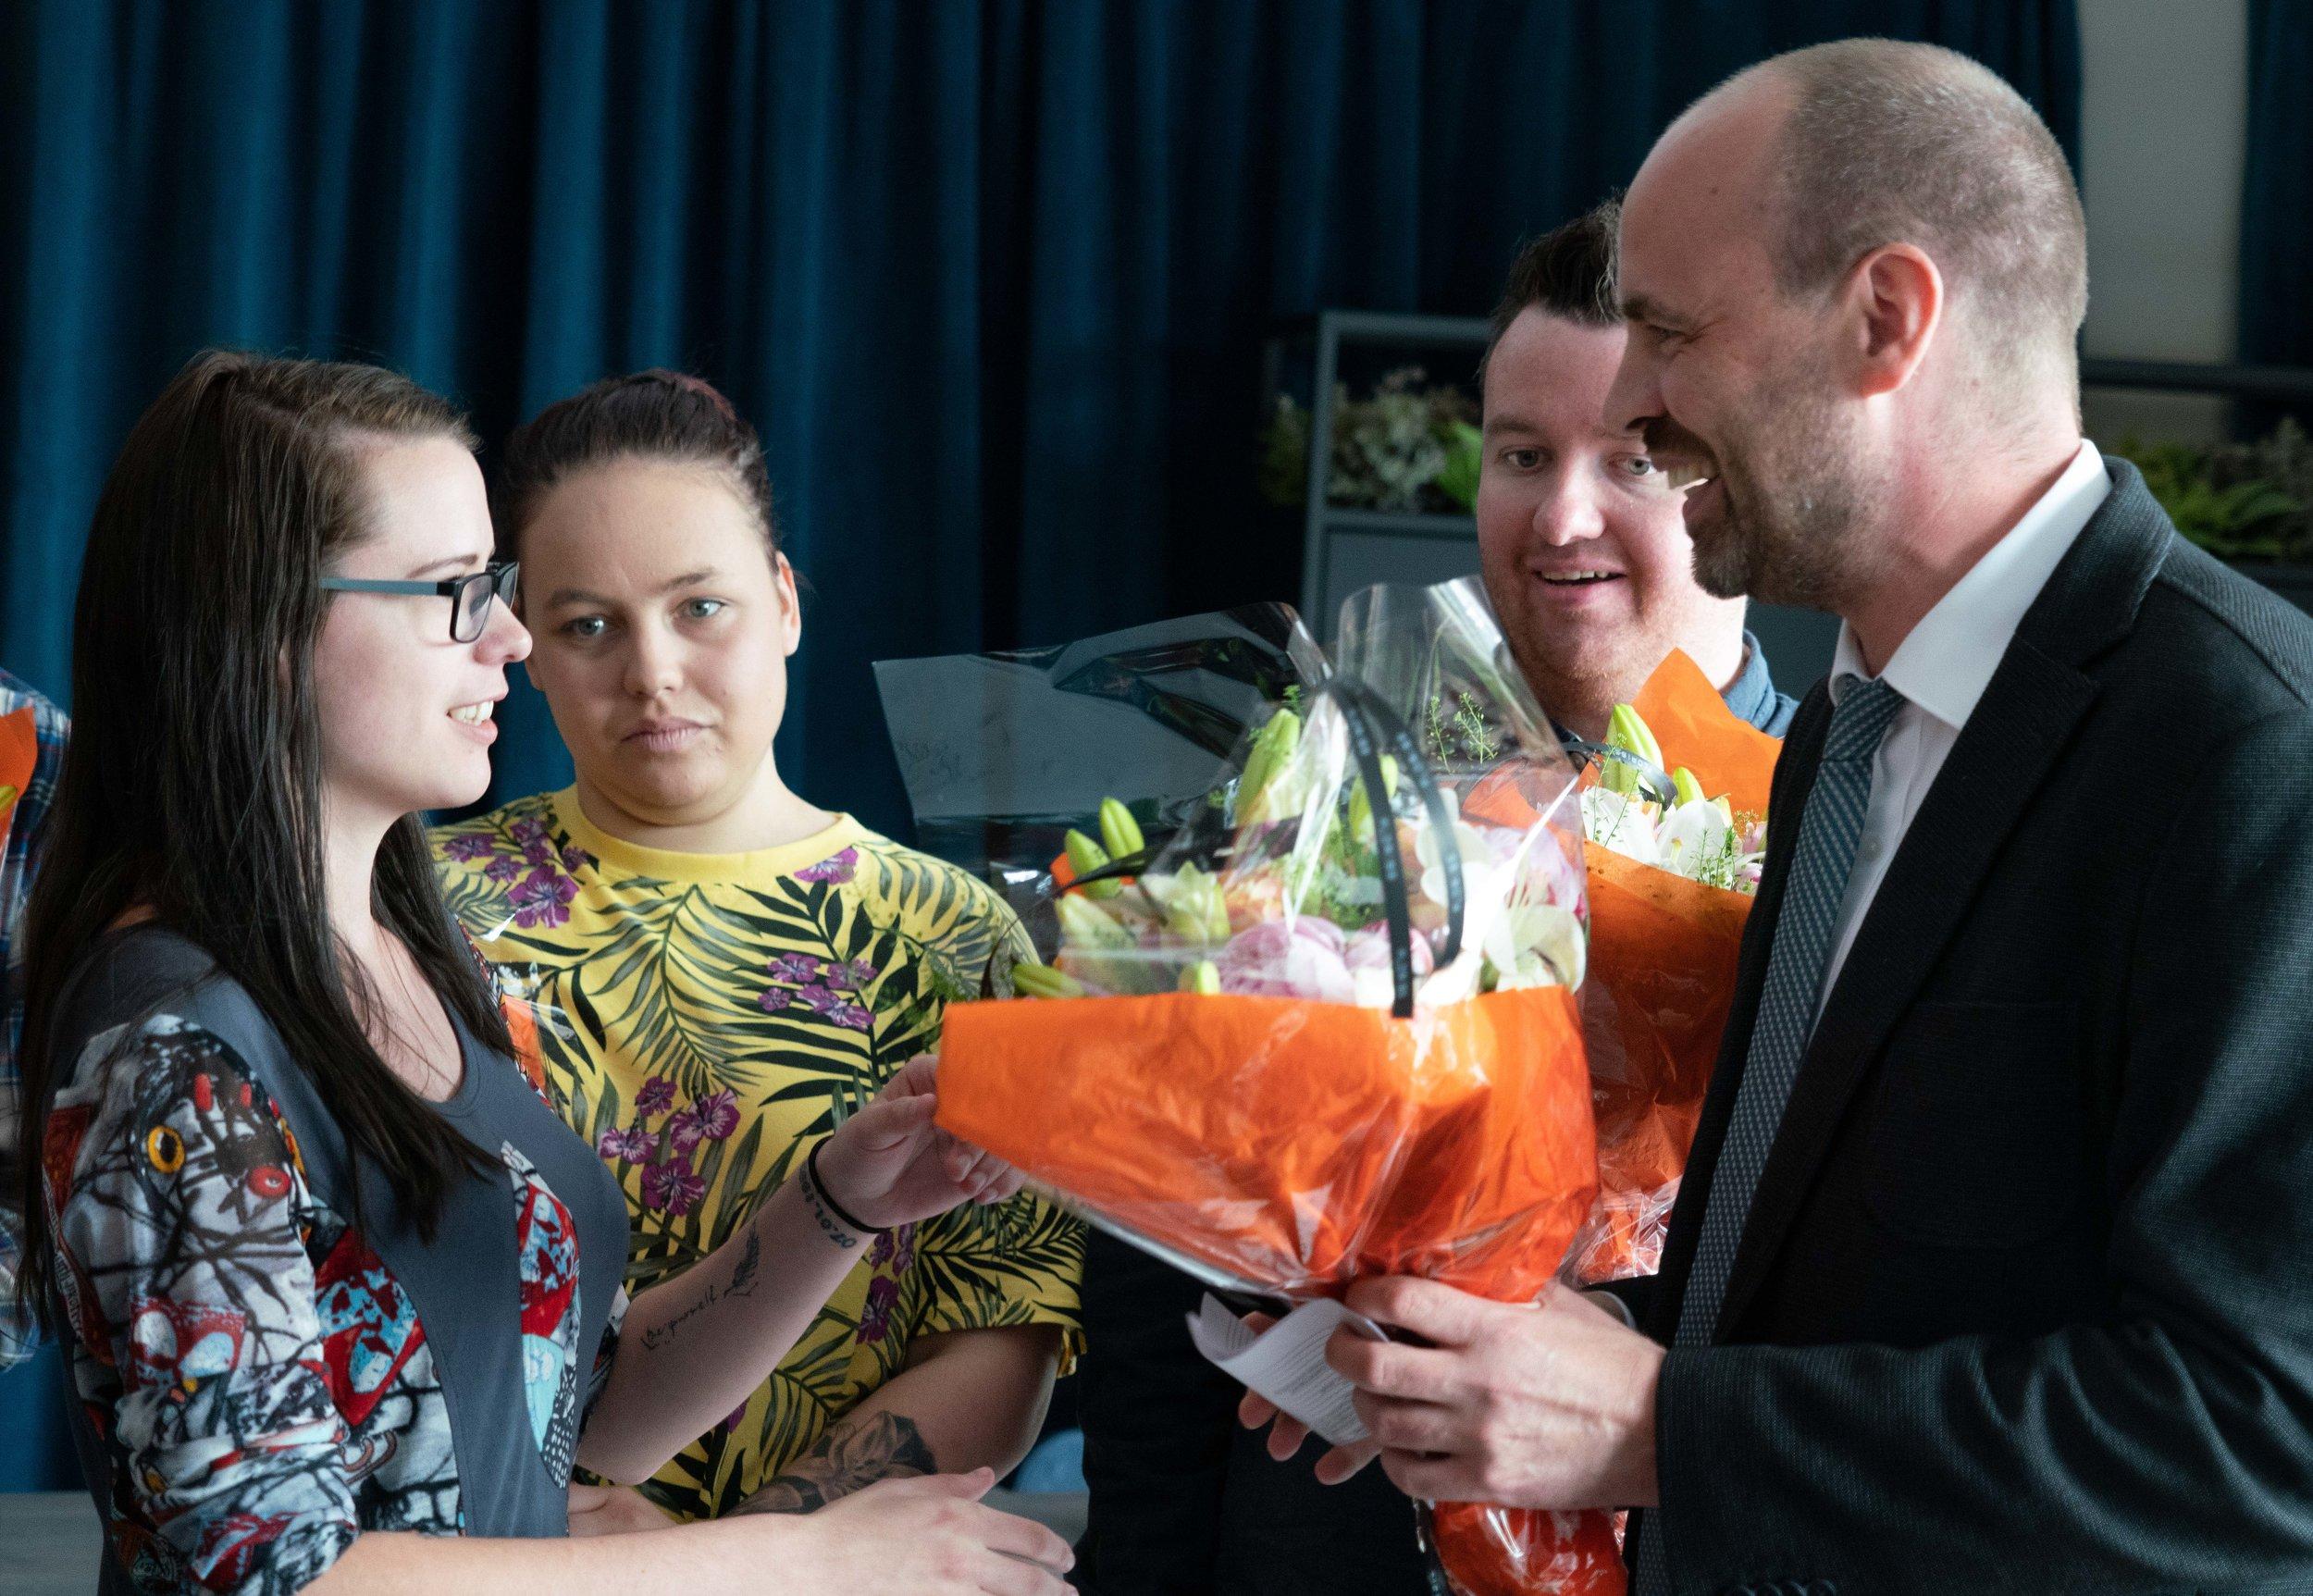 Fra venstre: Sonja Nathalie Aas Johansen, Tiril Alnæs Kvam, Robert Norli Hamnes og Arild Grande (A).